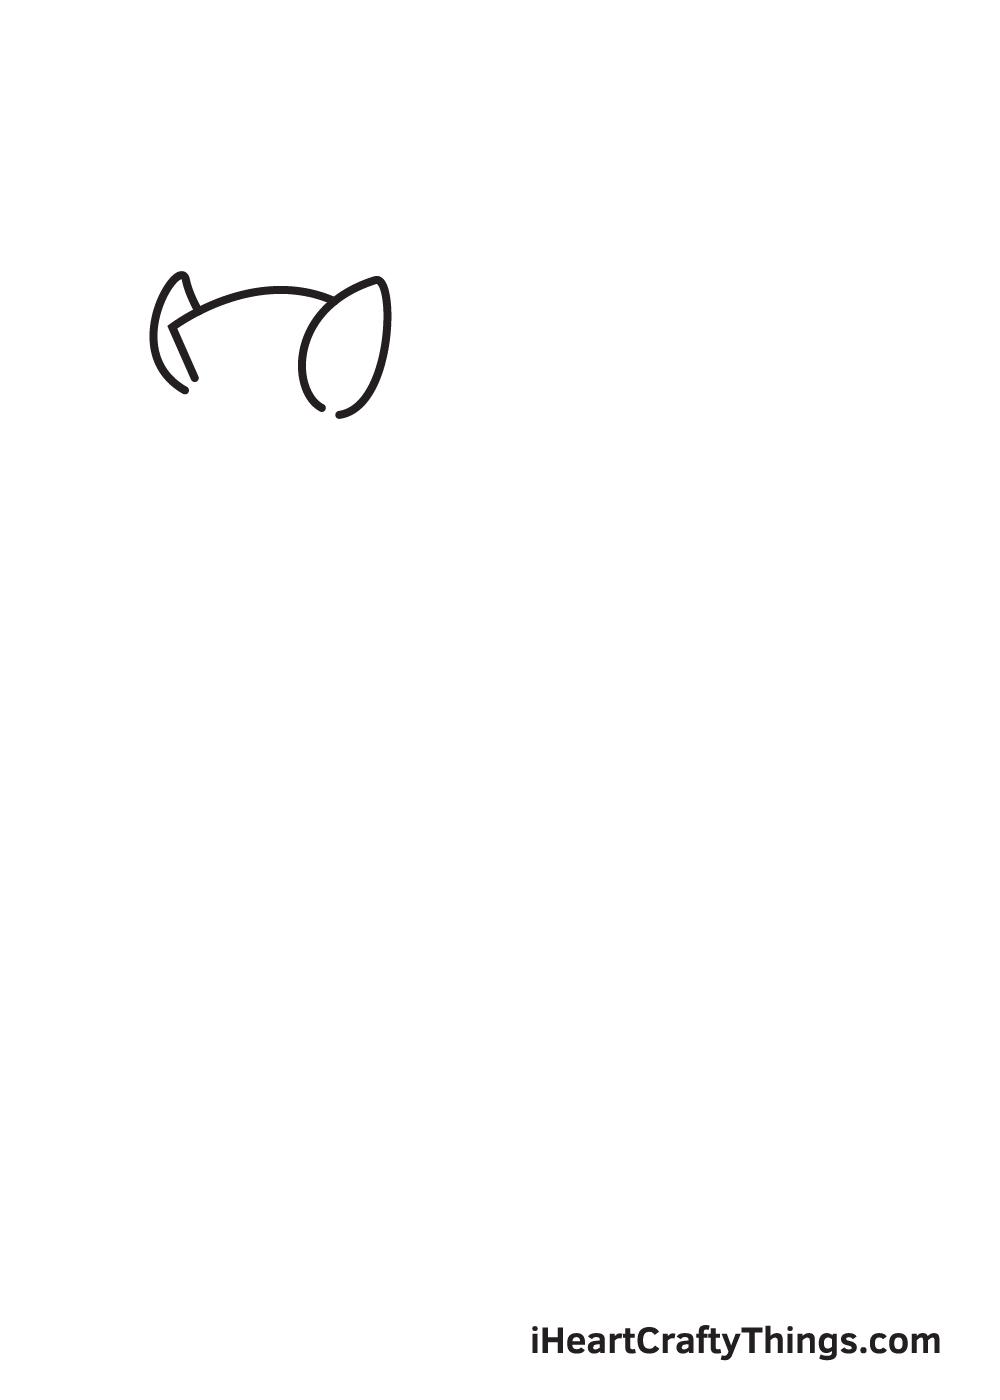 zebra drawing step 1